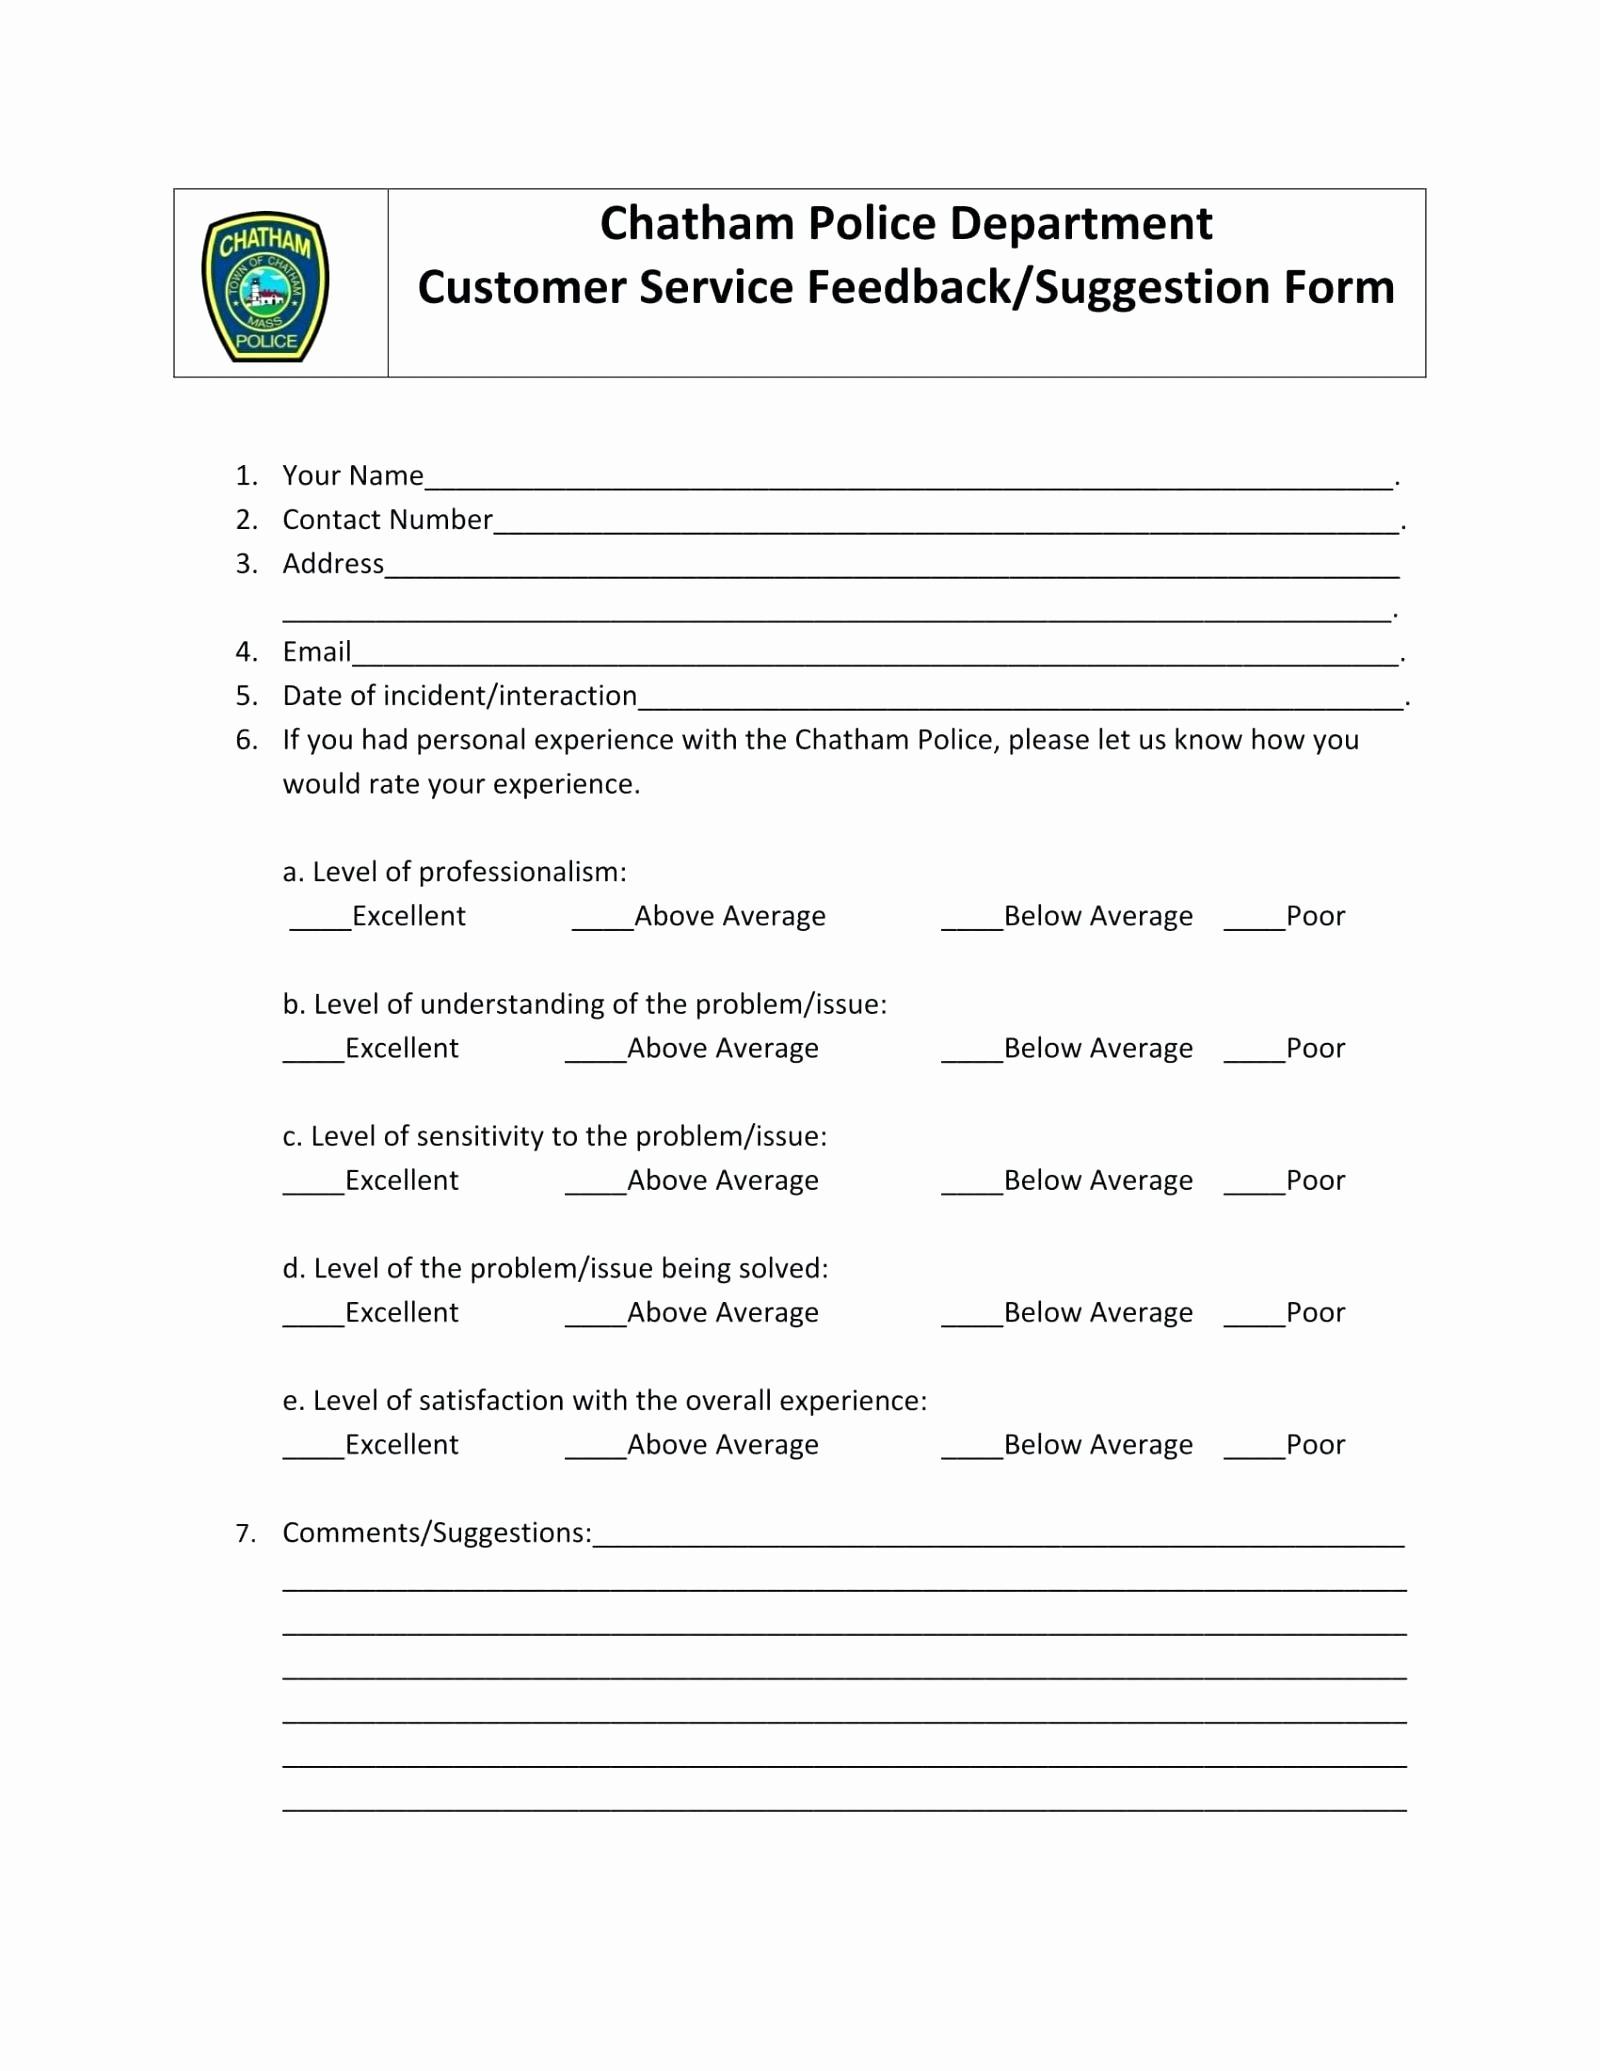 Customer Feedback form Template Word Luxury Template Customer Service Feedback Template